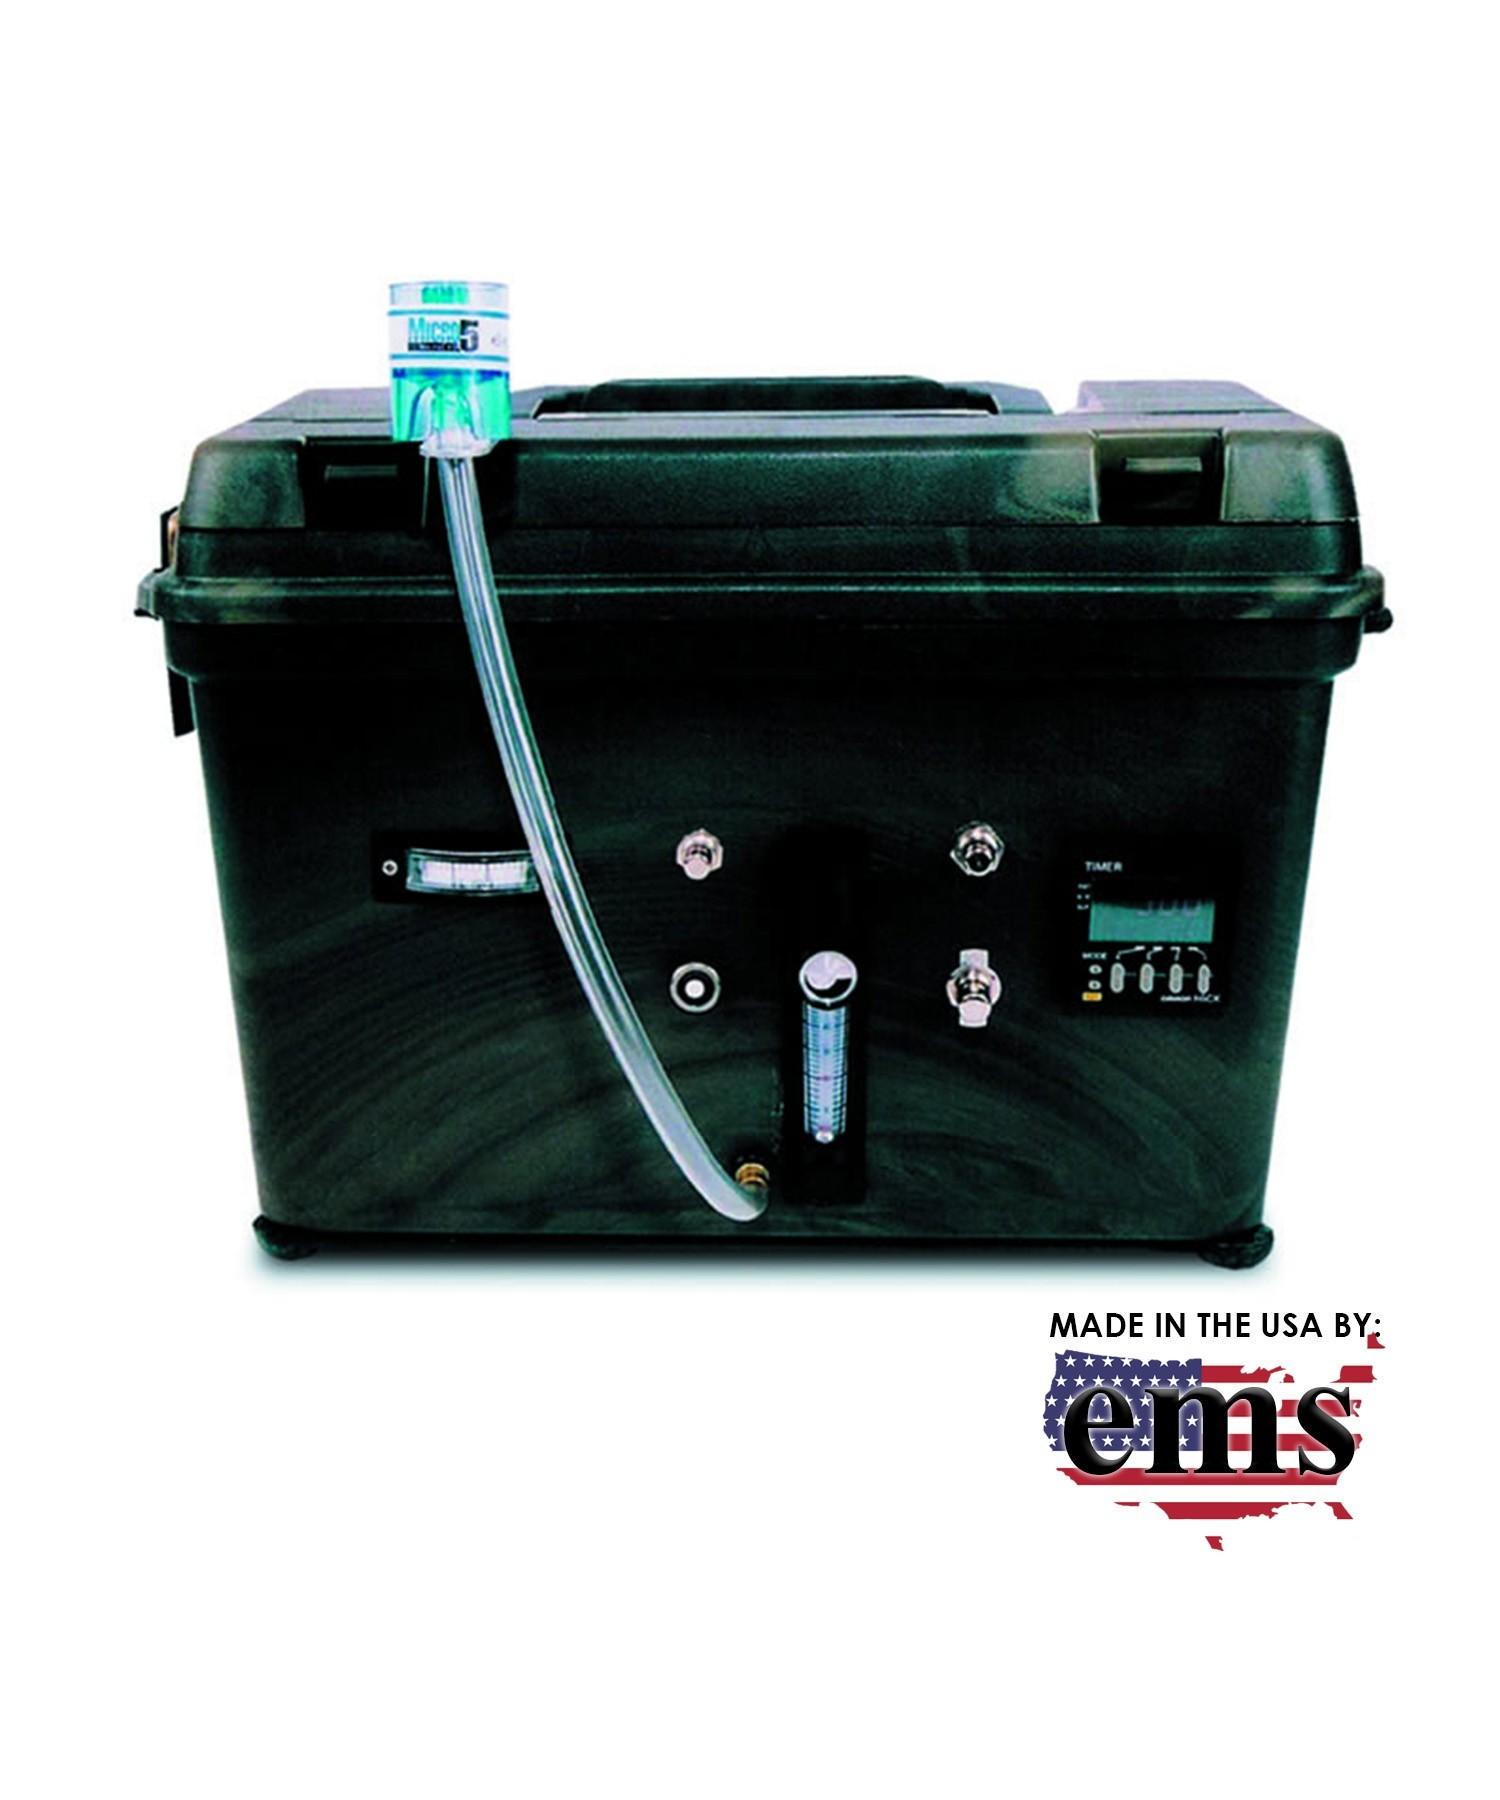 AC/DC IAQ Pump (GREEN CASE)